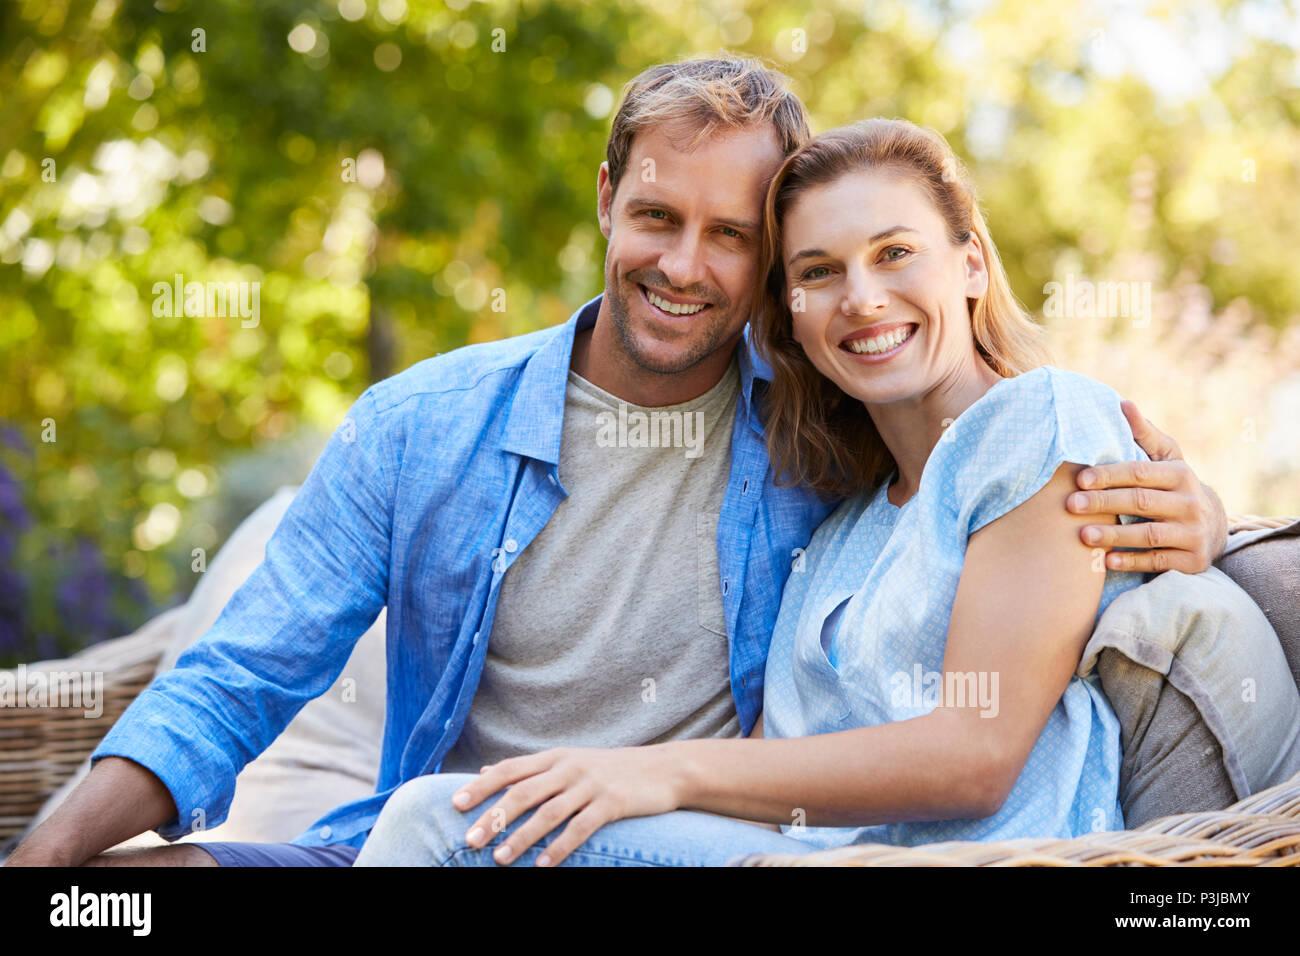 White couple images